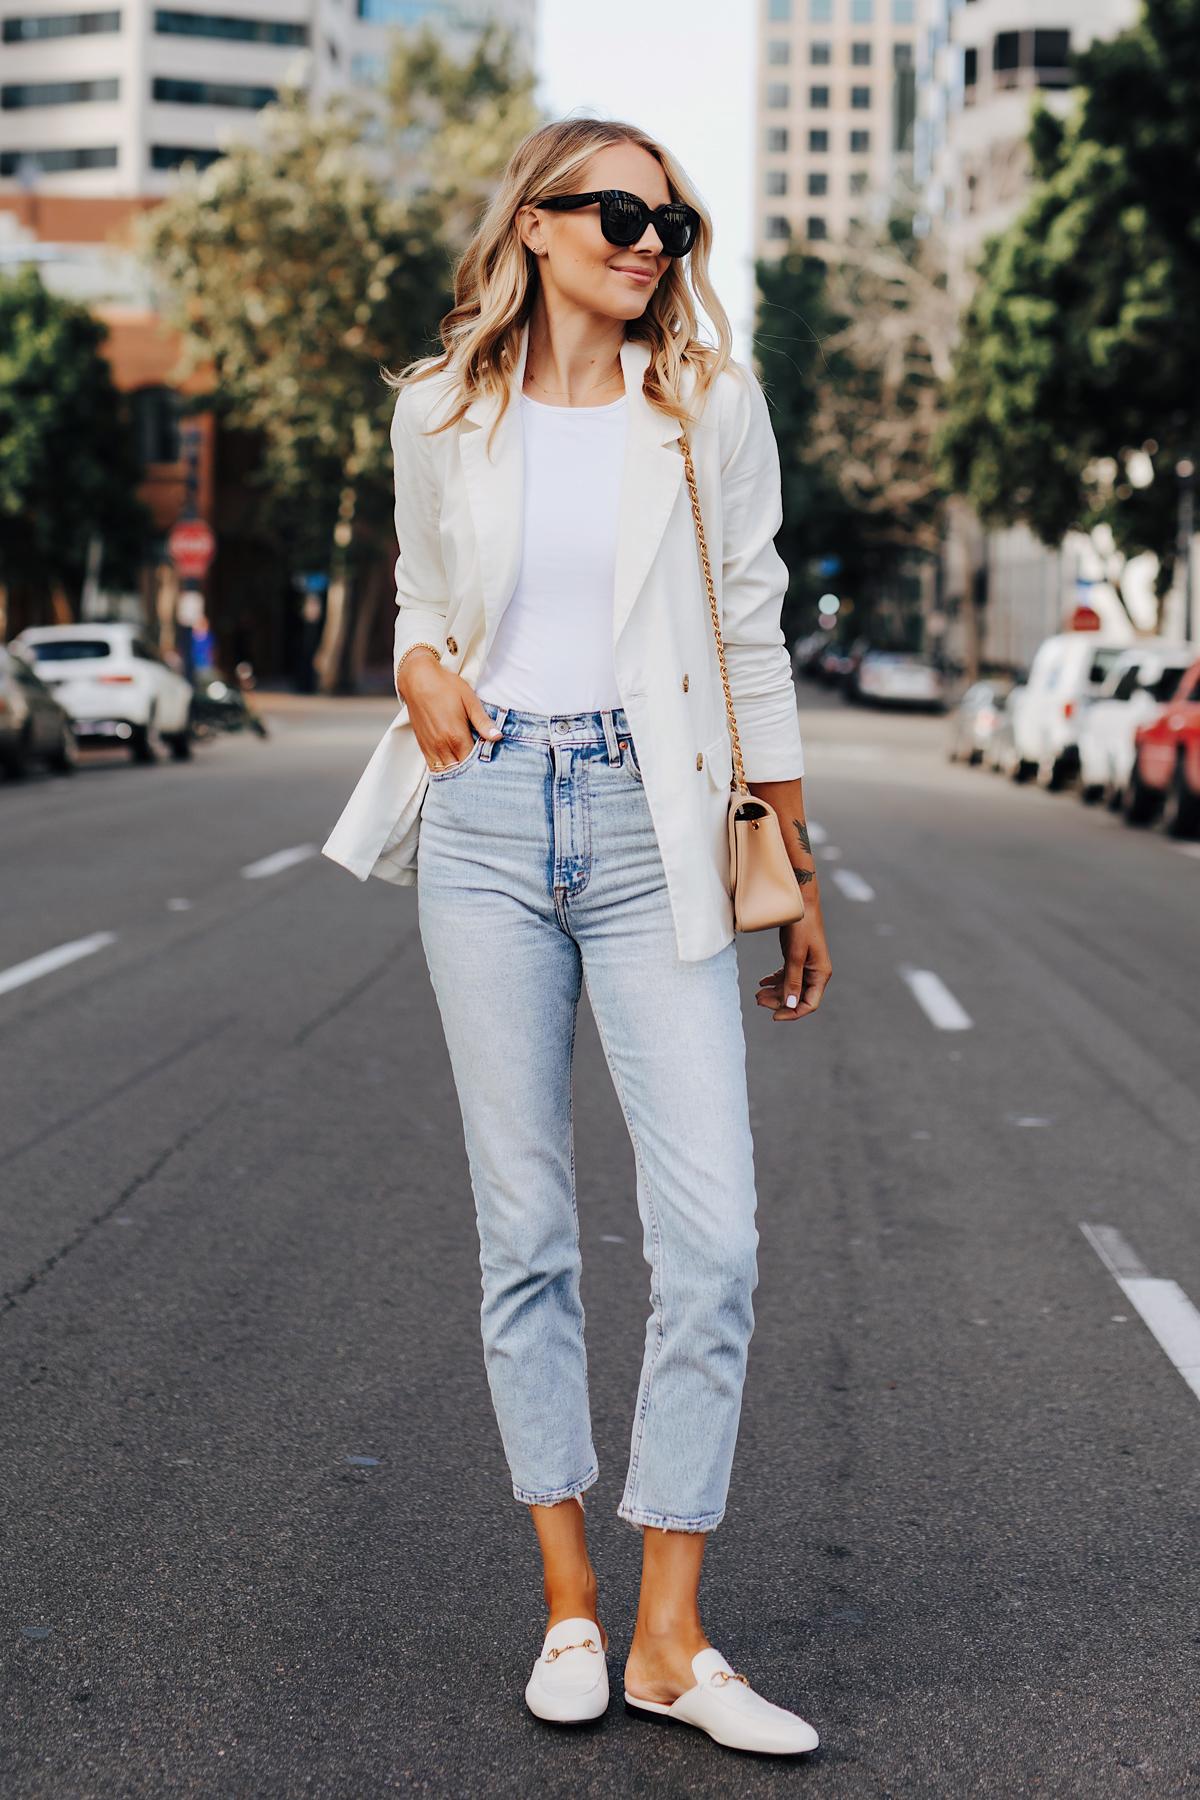 Fashion Jackson Wearing Abercrombie White Linen Blazer White Top Straigt Leg Cropped Jeans Gucci Princetown Mules White Beige Chanel Handbag 1